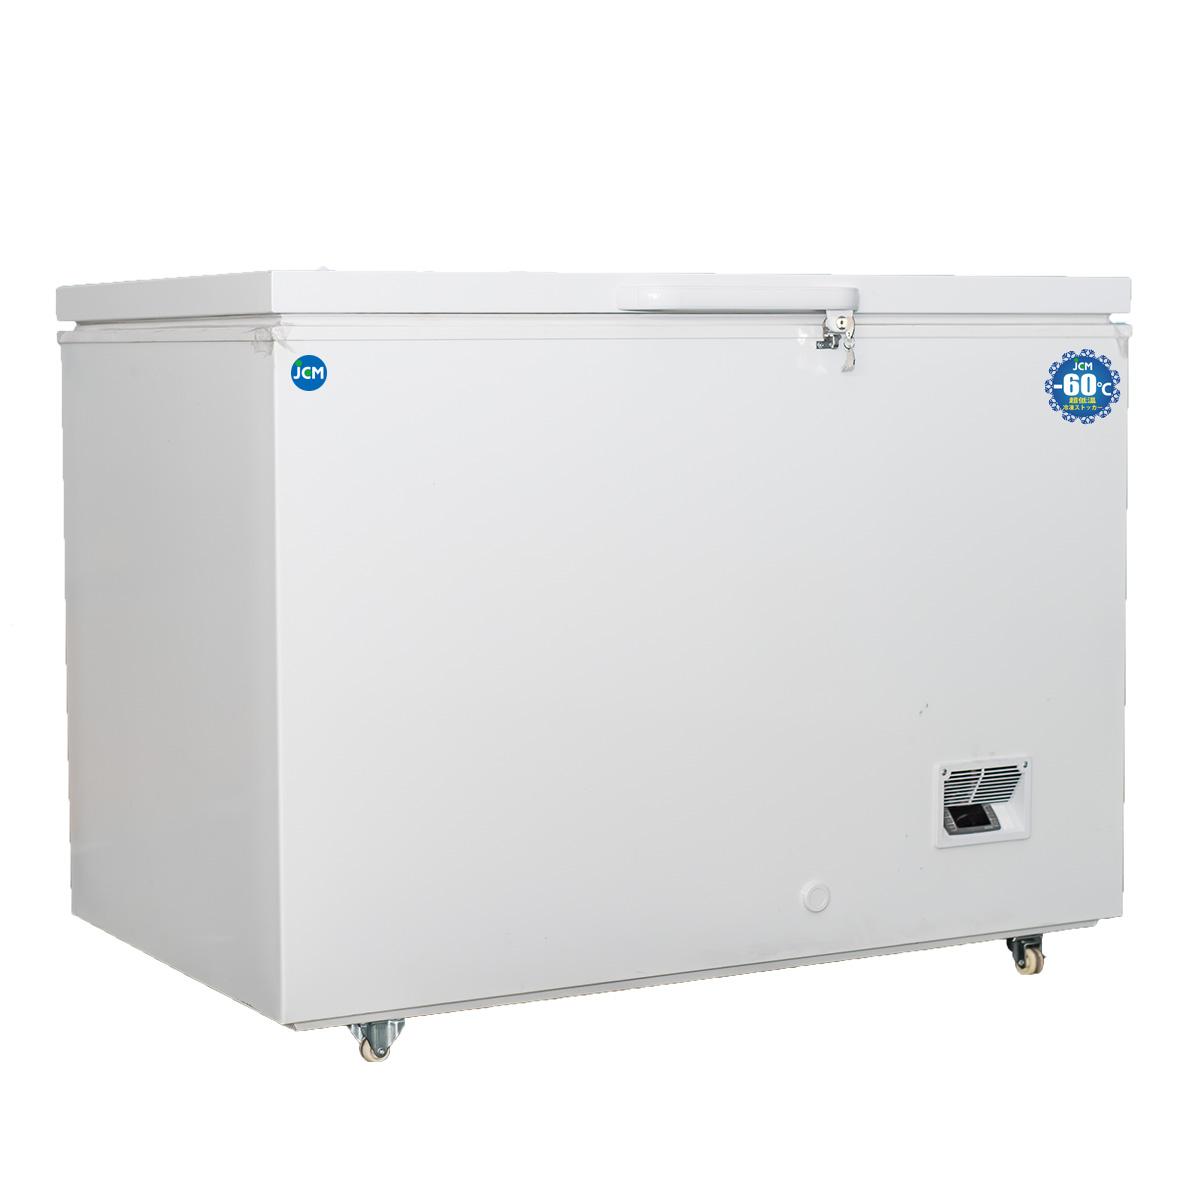 JCM 超低温冷凍ストッカー 231L JCMCC-230 業務用 -60℃ 超低温 冷凍庫 冷凍ストッカー ストッカー 【代引不可】